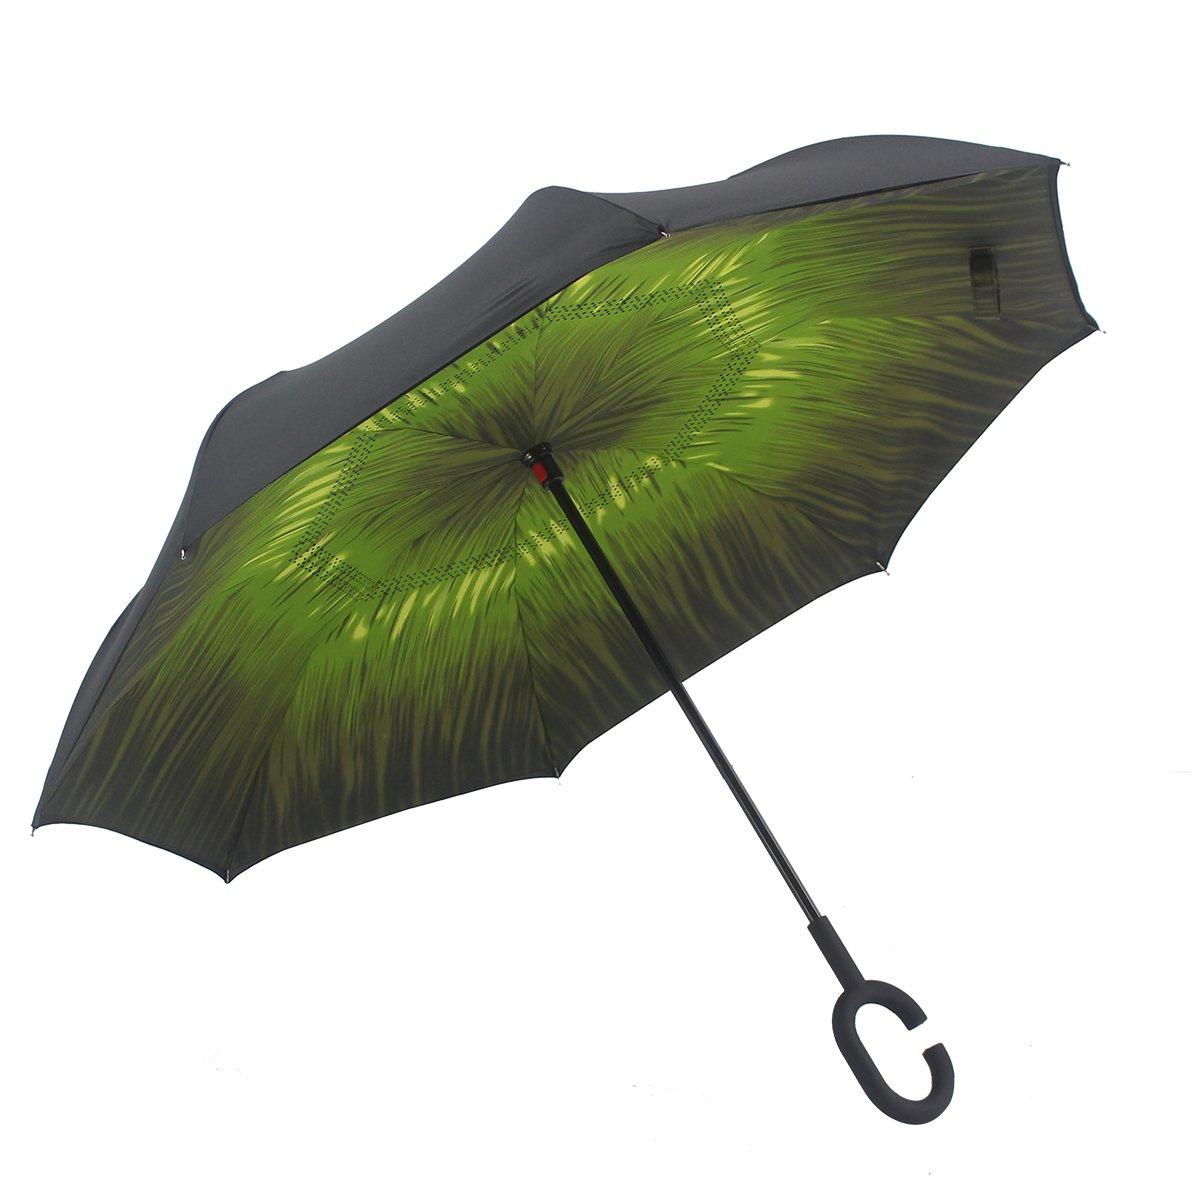 SIKAINI Inverted Umbrella Automatic Double-Layer Windproof,Travel Reverse Umbrellas UV Proof Folding for Women/Men. (green-1)